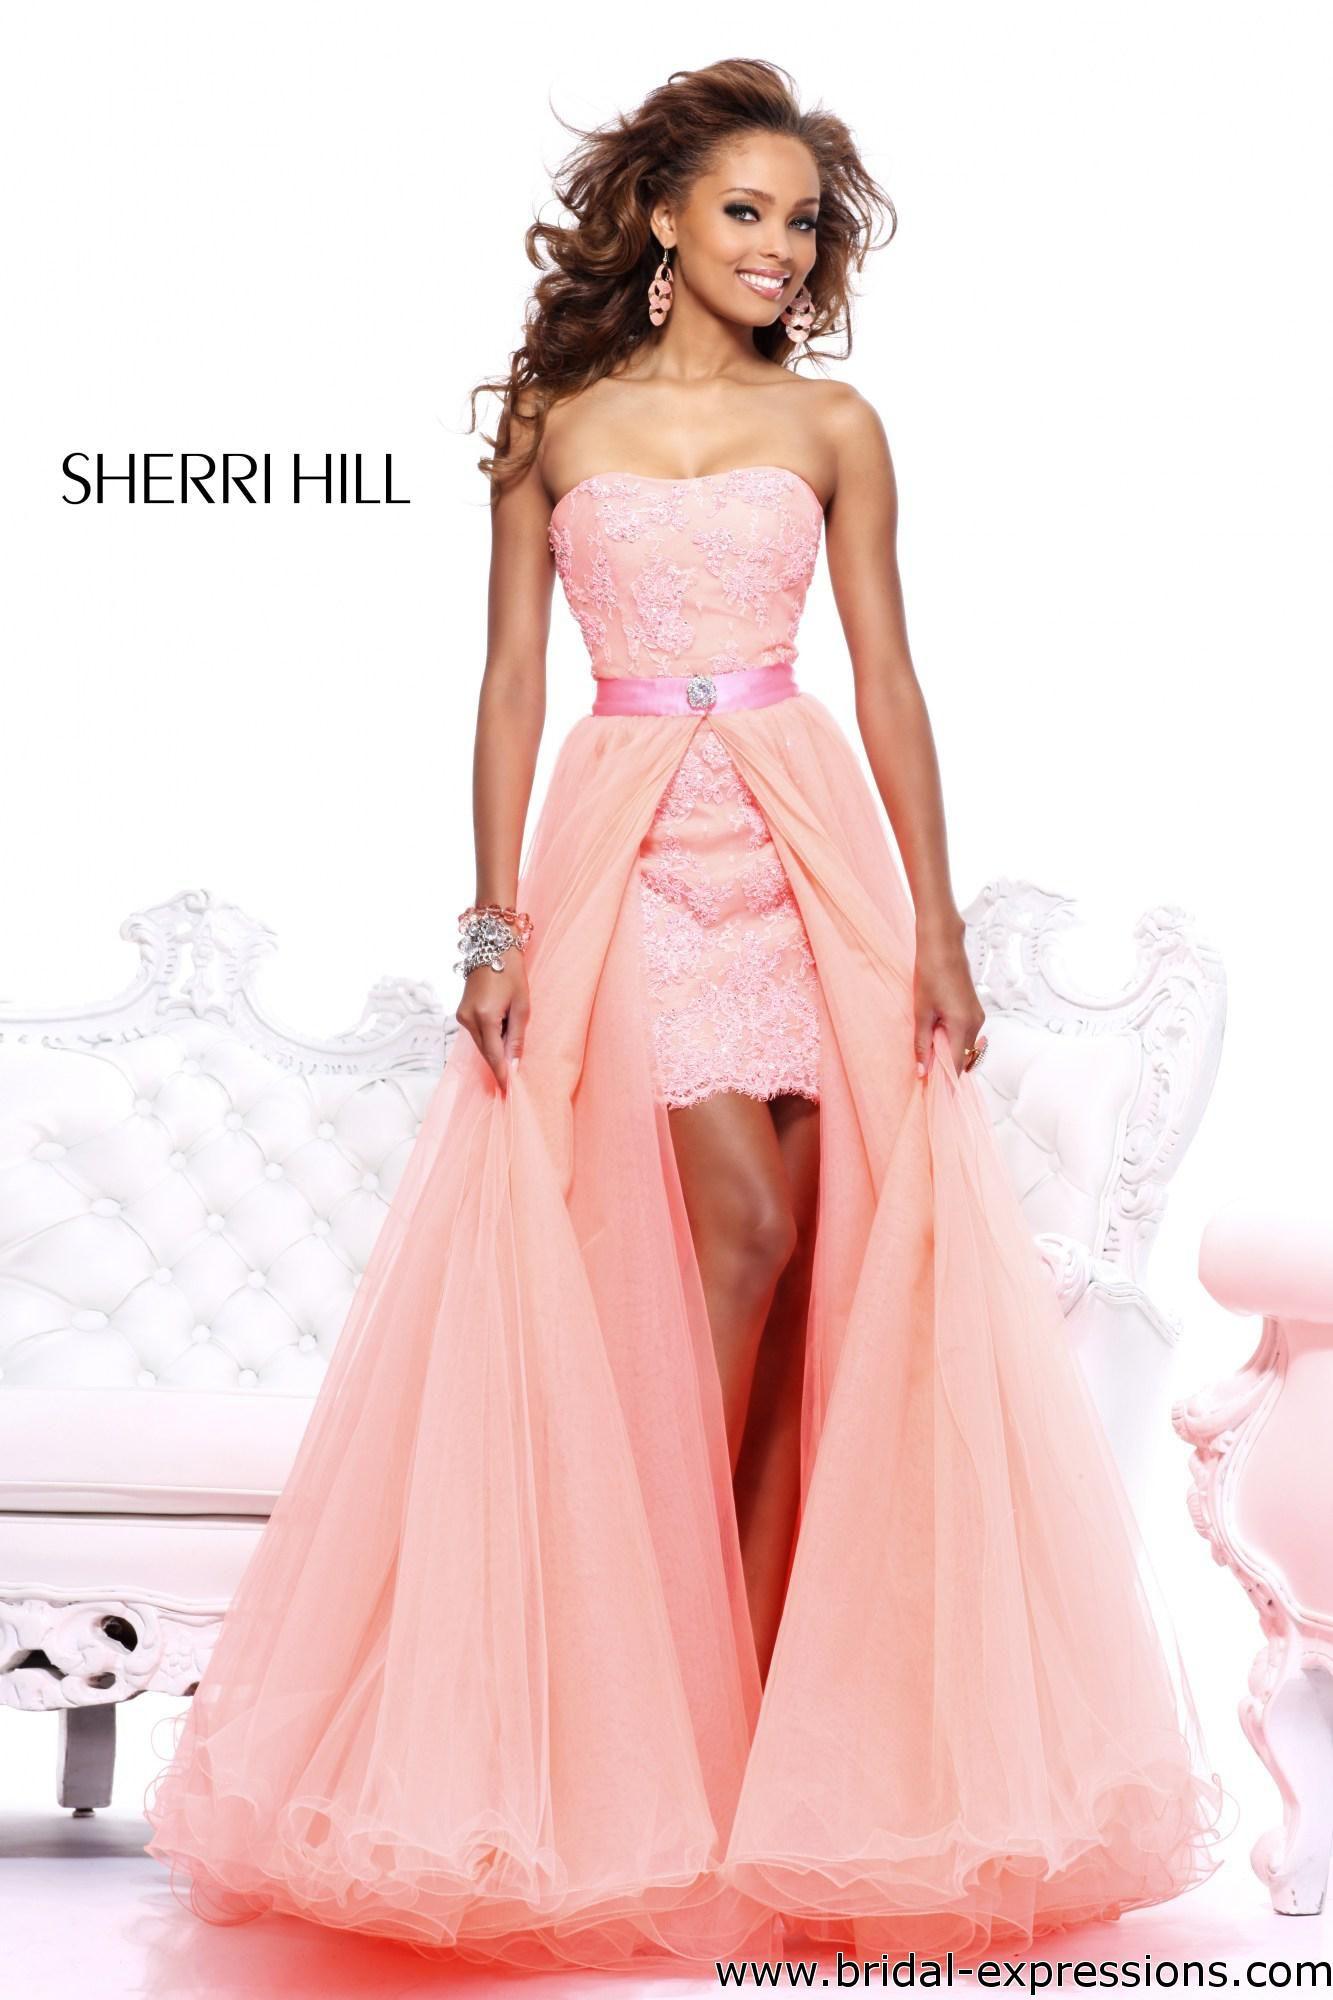 Cute short wedding dresses  removable wedding skirt for a short dress  Sherri Hill